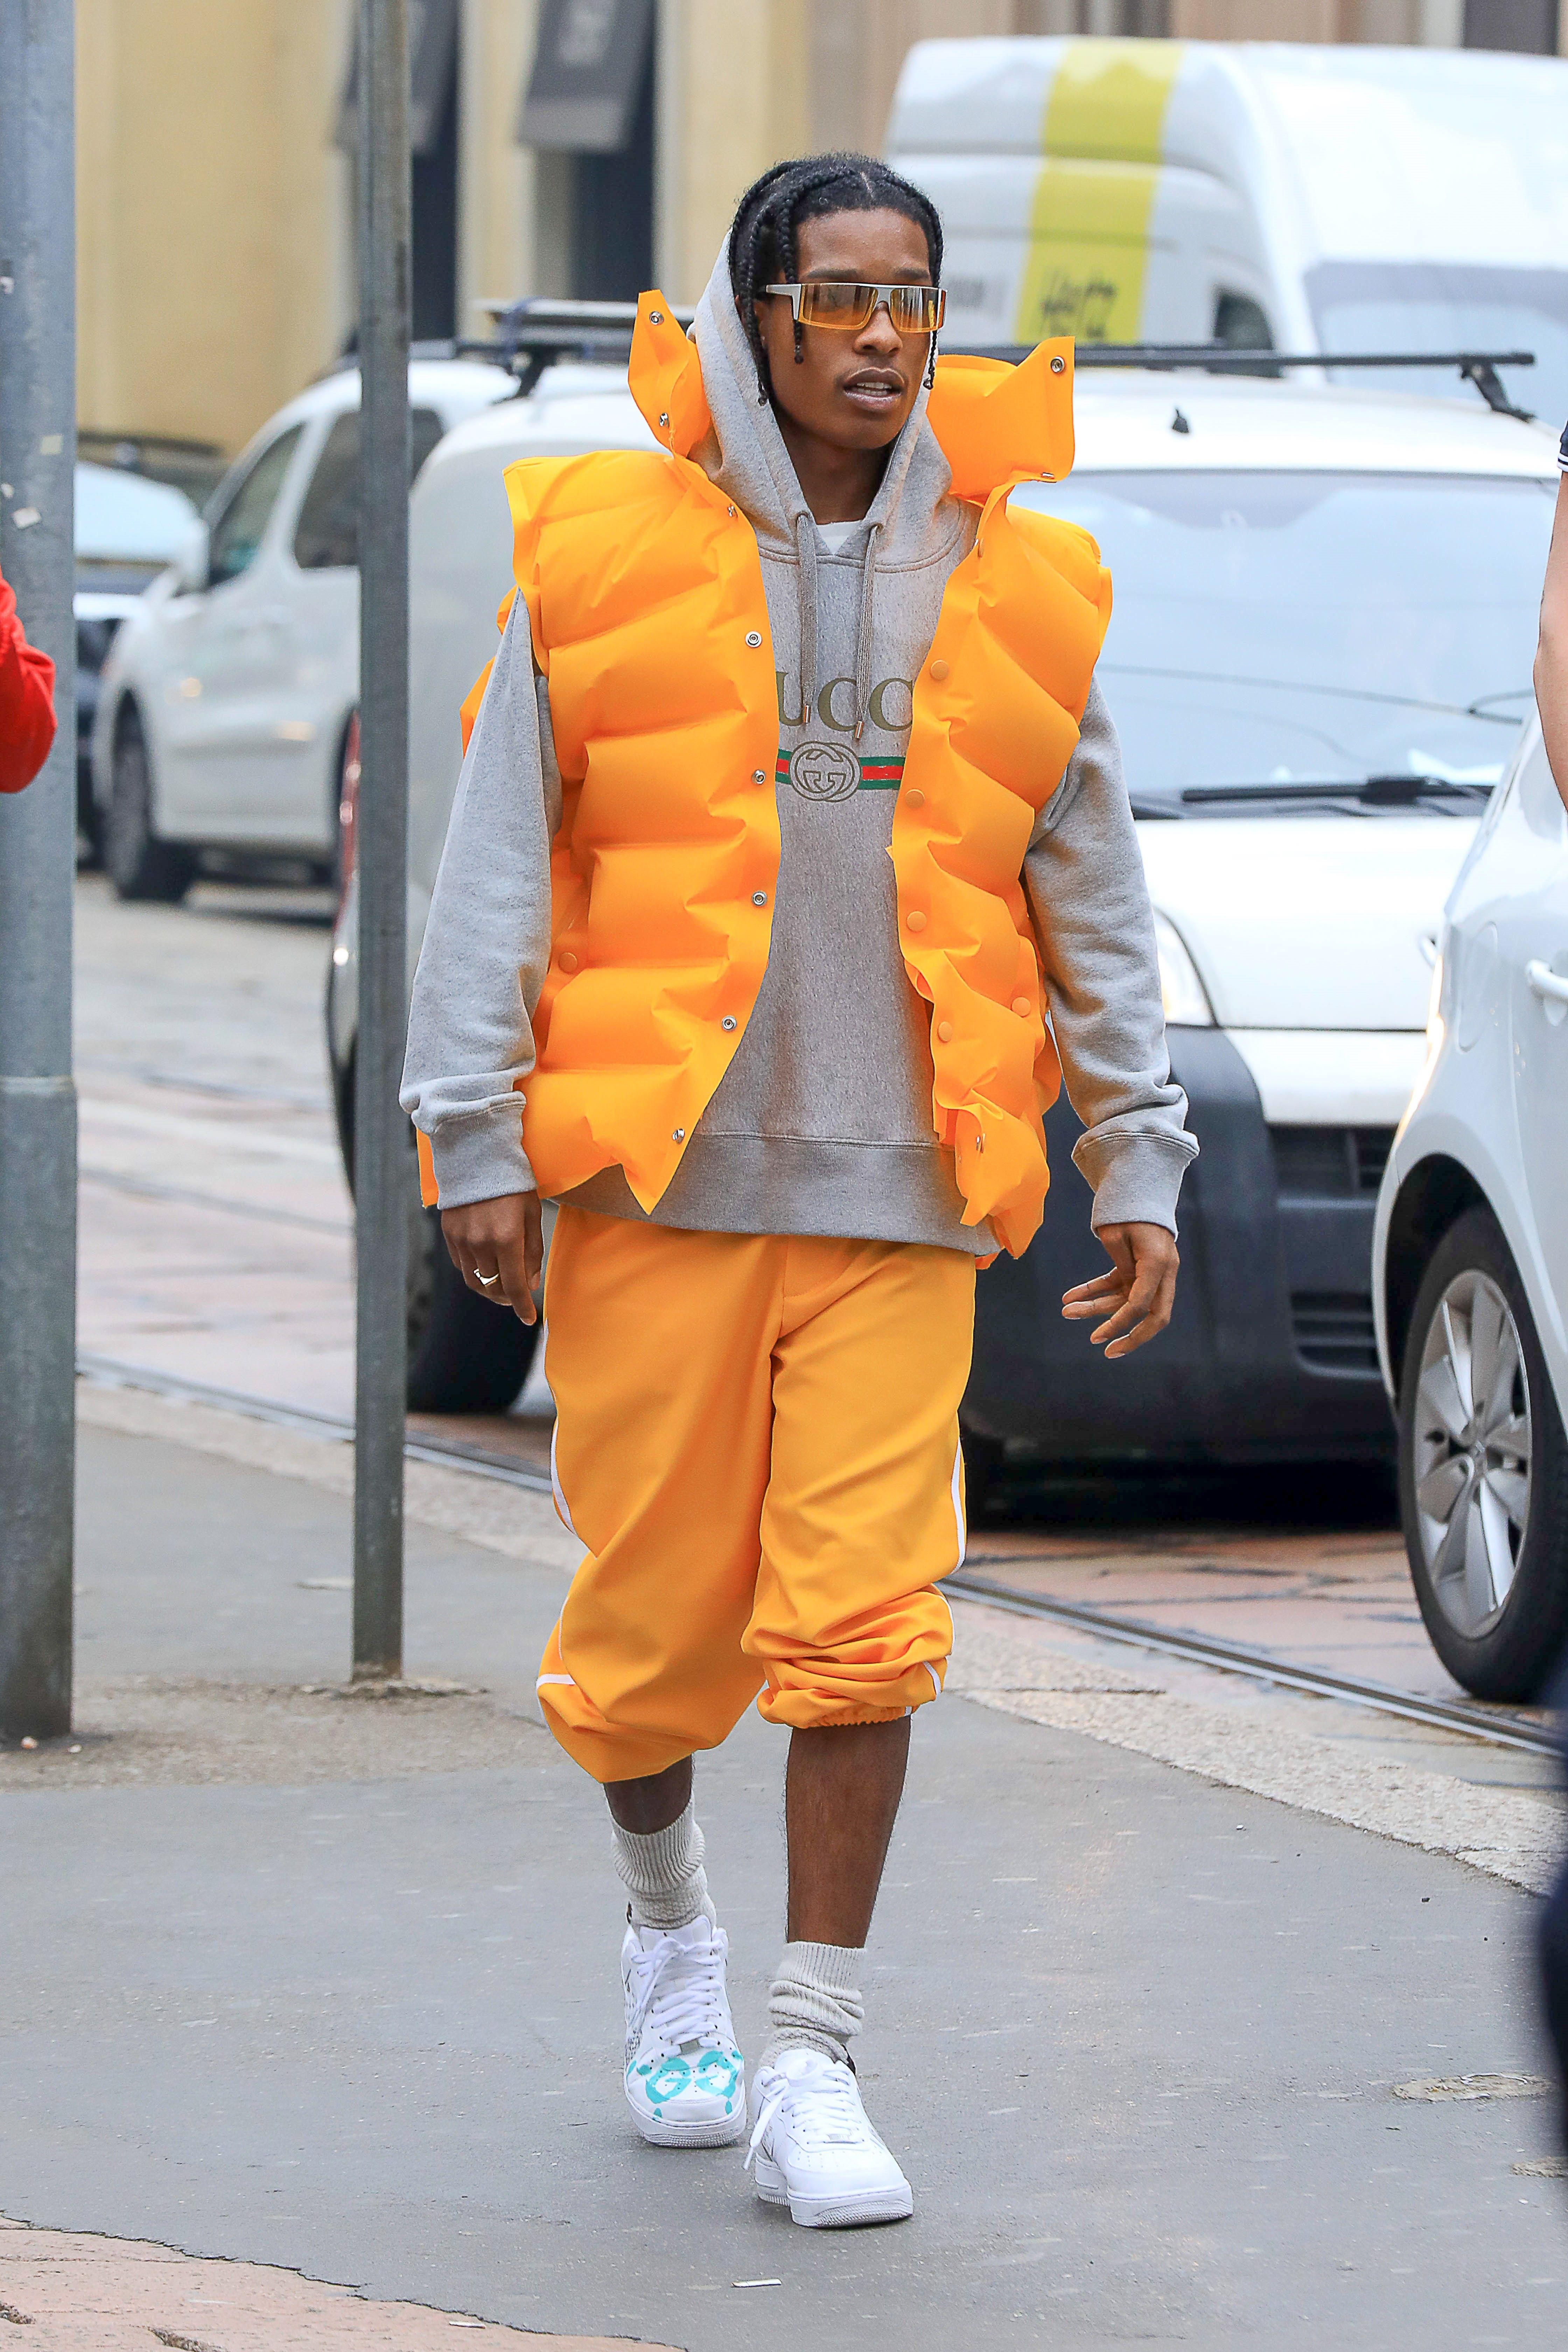 Asap Rocky Feeling Yellow On Asap Rocky Fashion Rapper